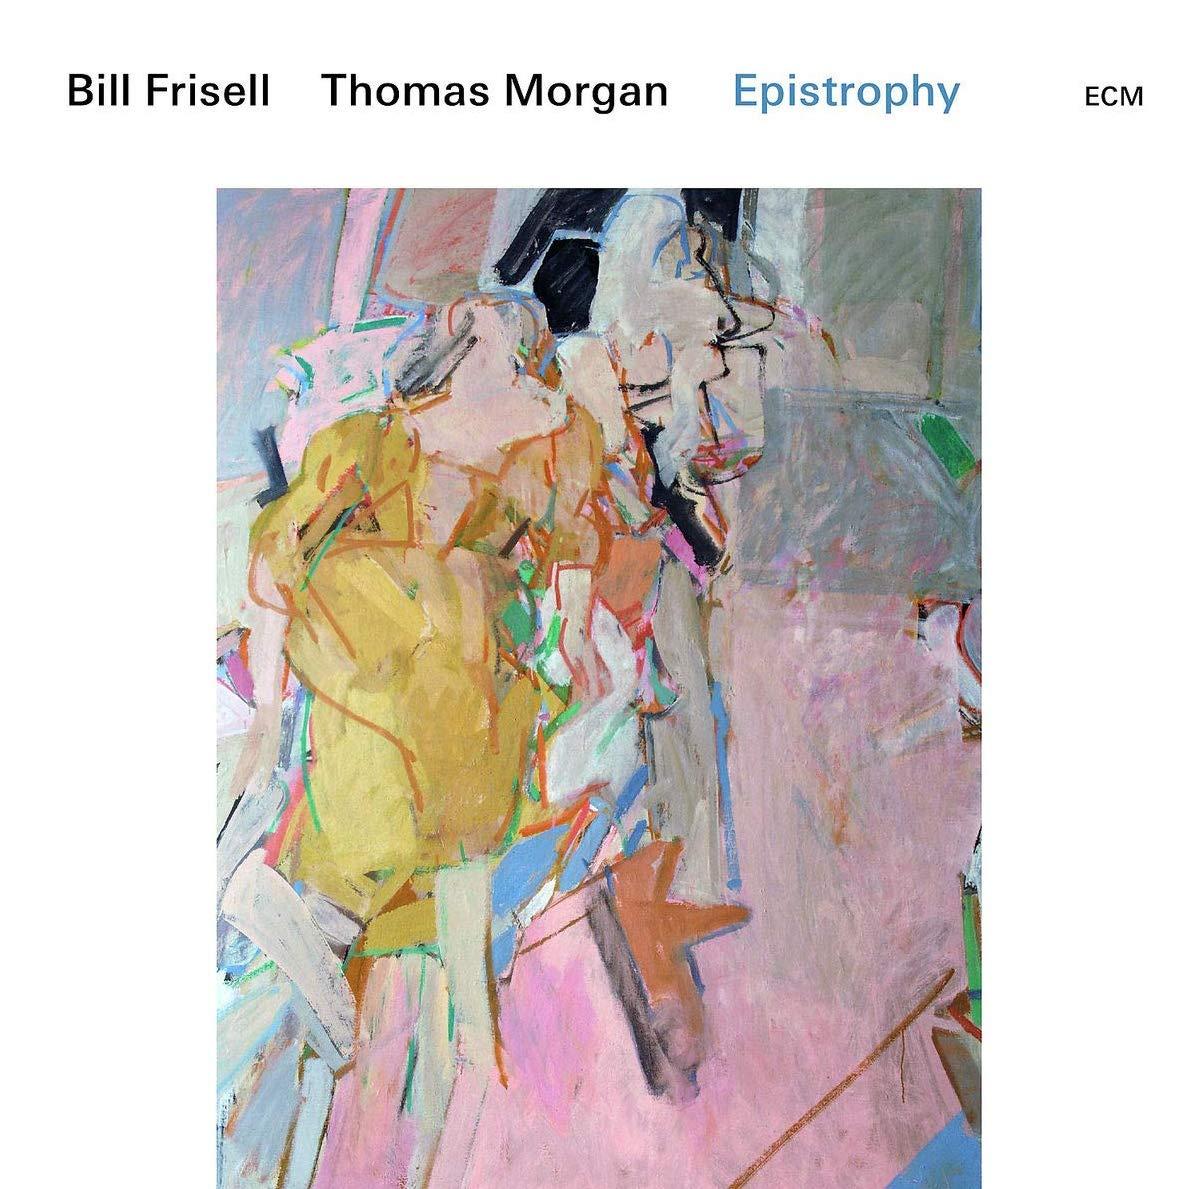 「bill frisell thomas morgan」の画像検索結果